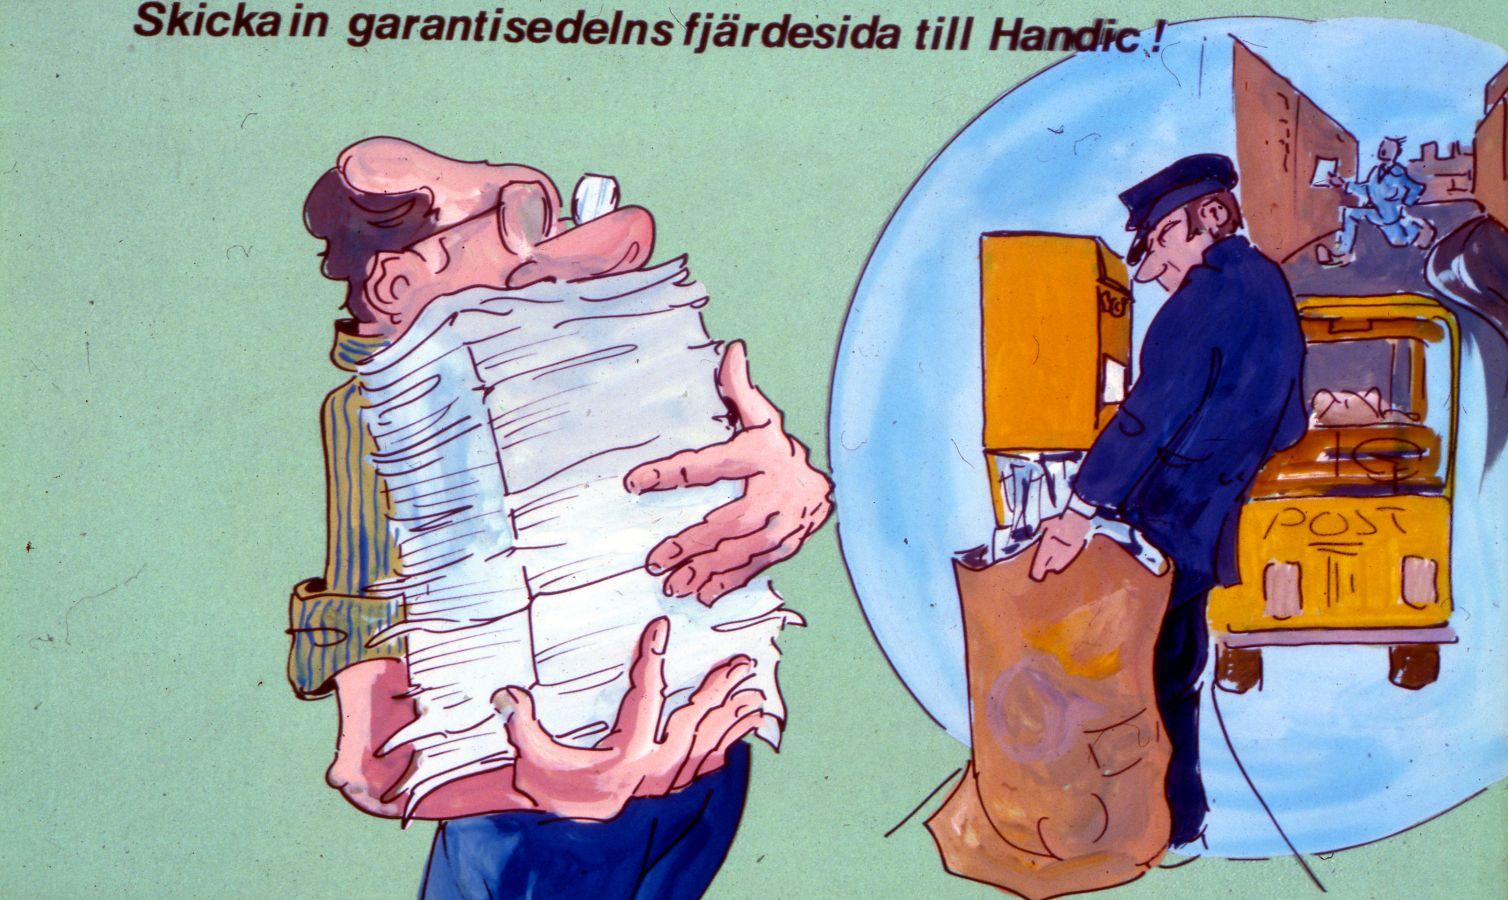 handic_byt_1983 (1)